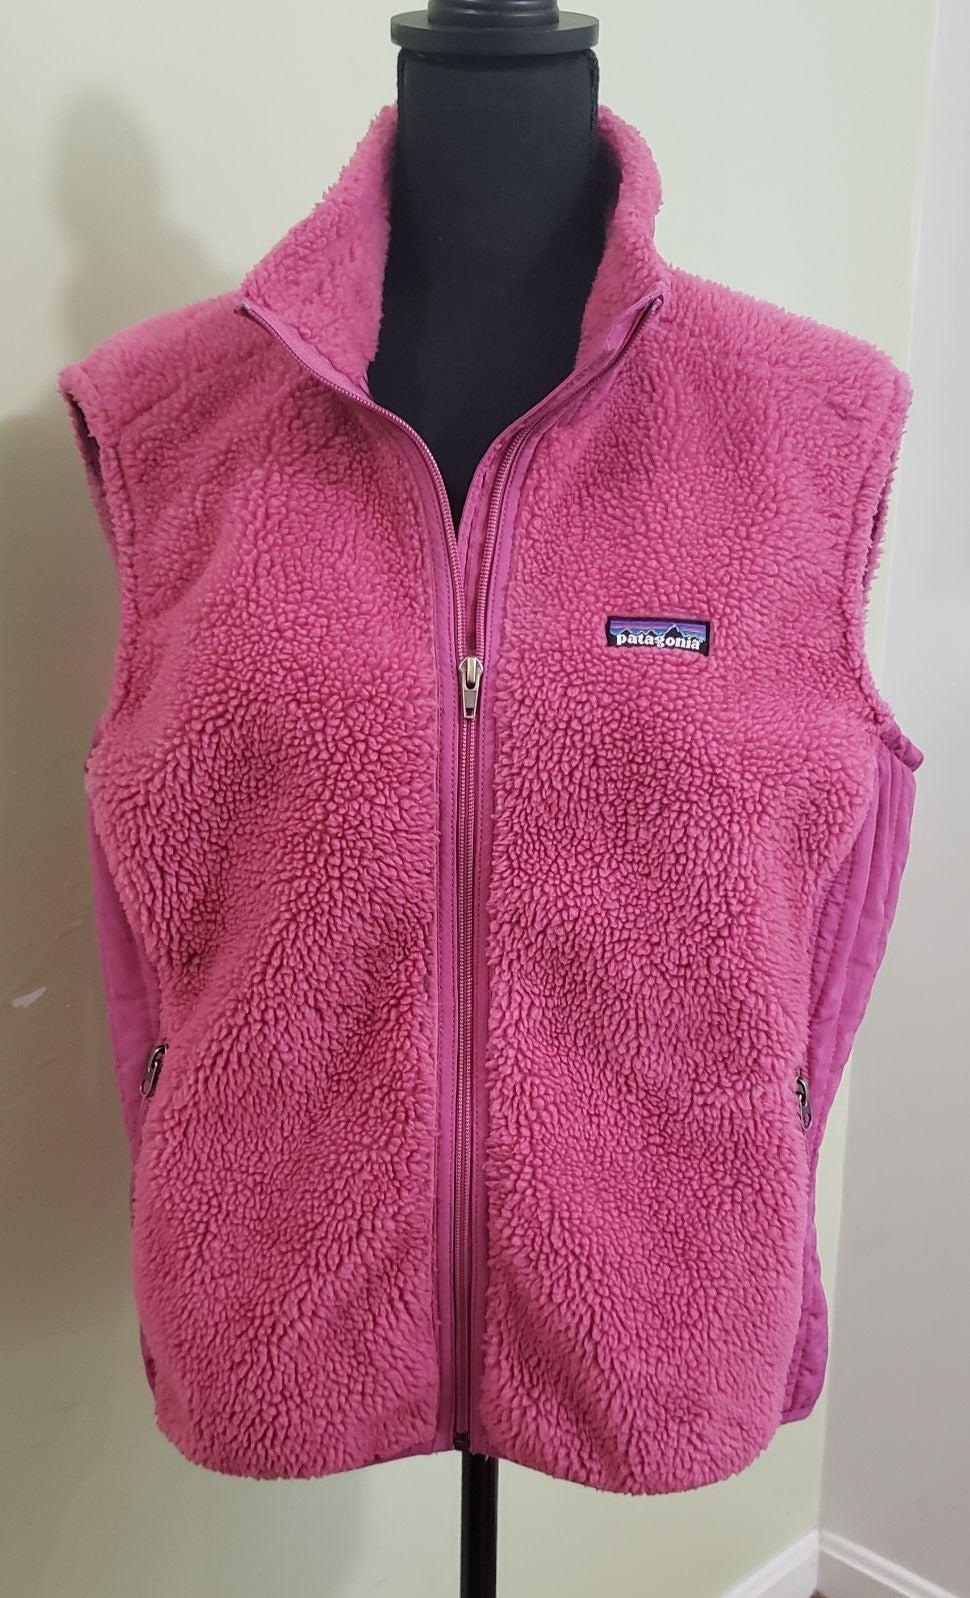 Patagonia Polyester Fleece Fuzzy Vest